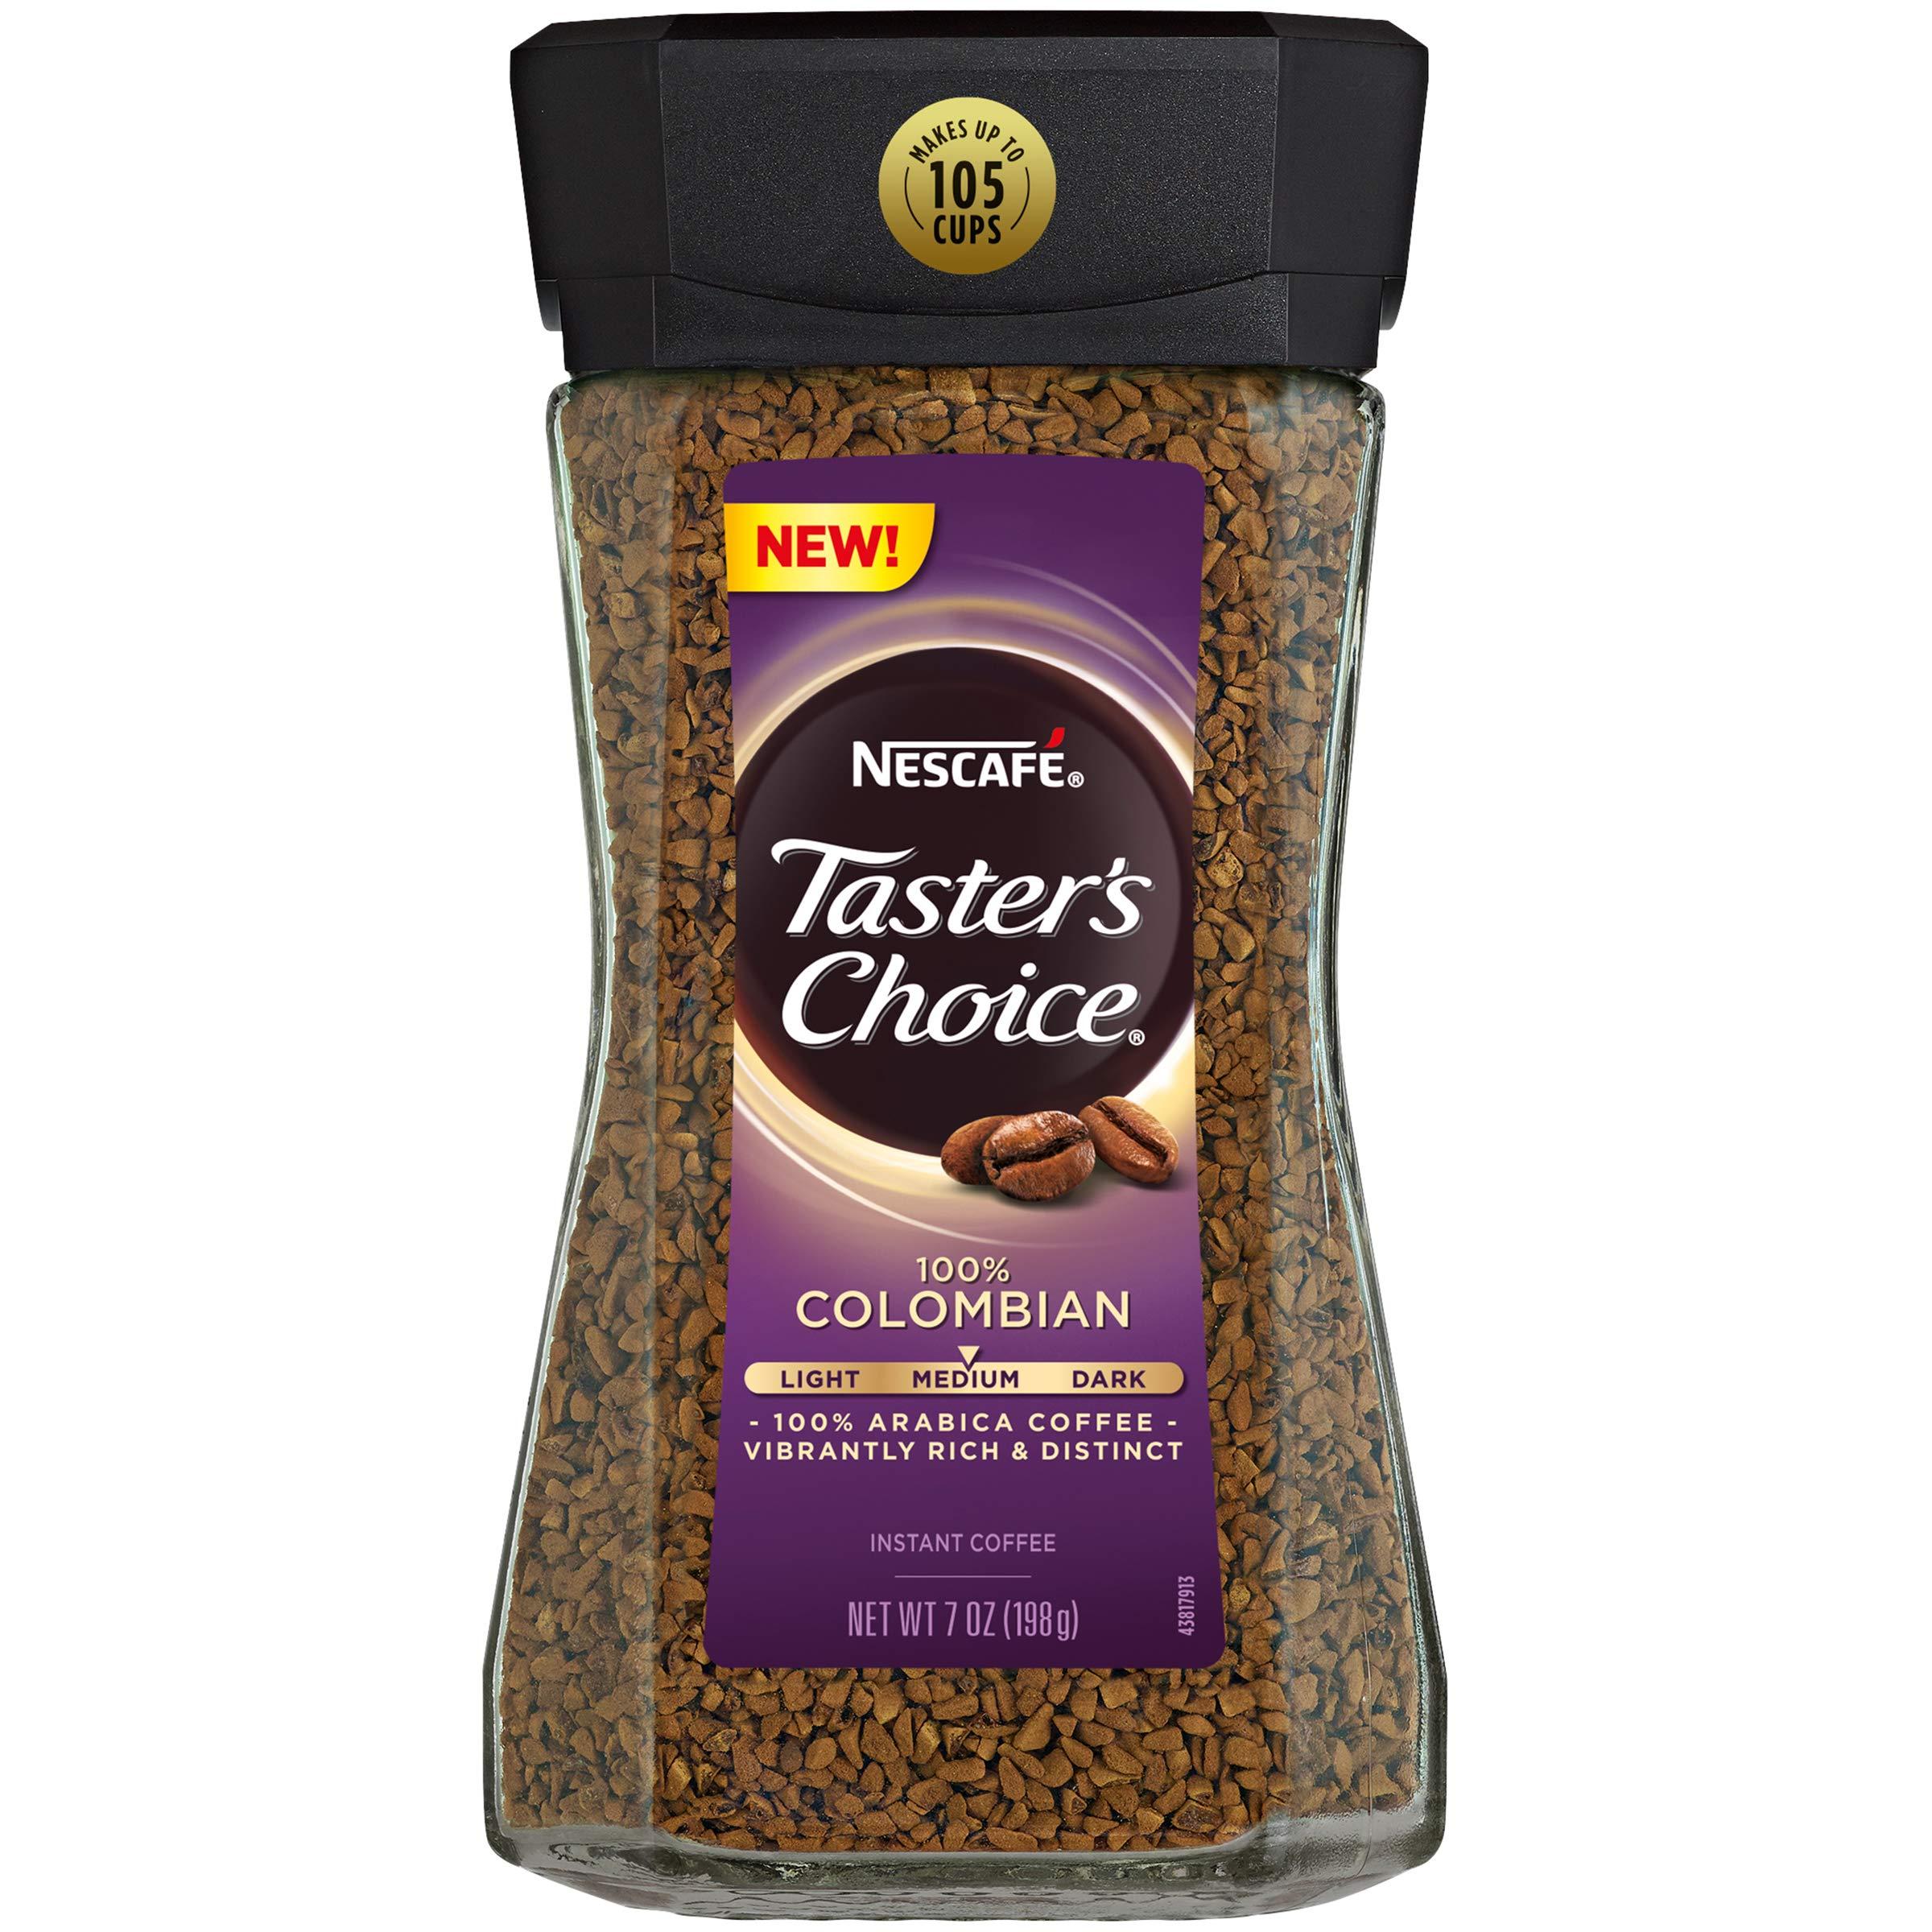 Nescafe Taster's Choice 100% Colombian Medium Roast Instant Coffee, 100% Colombian Medium Roast, 4Count by Taster's Choice